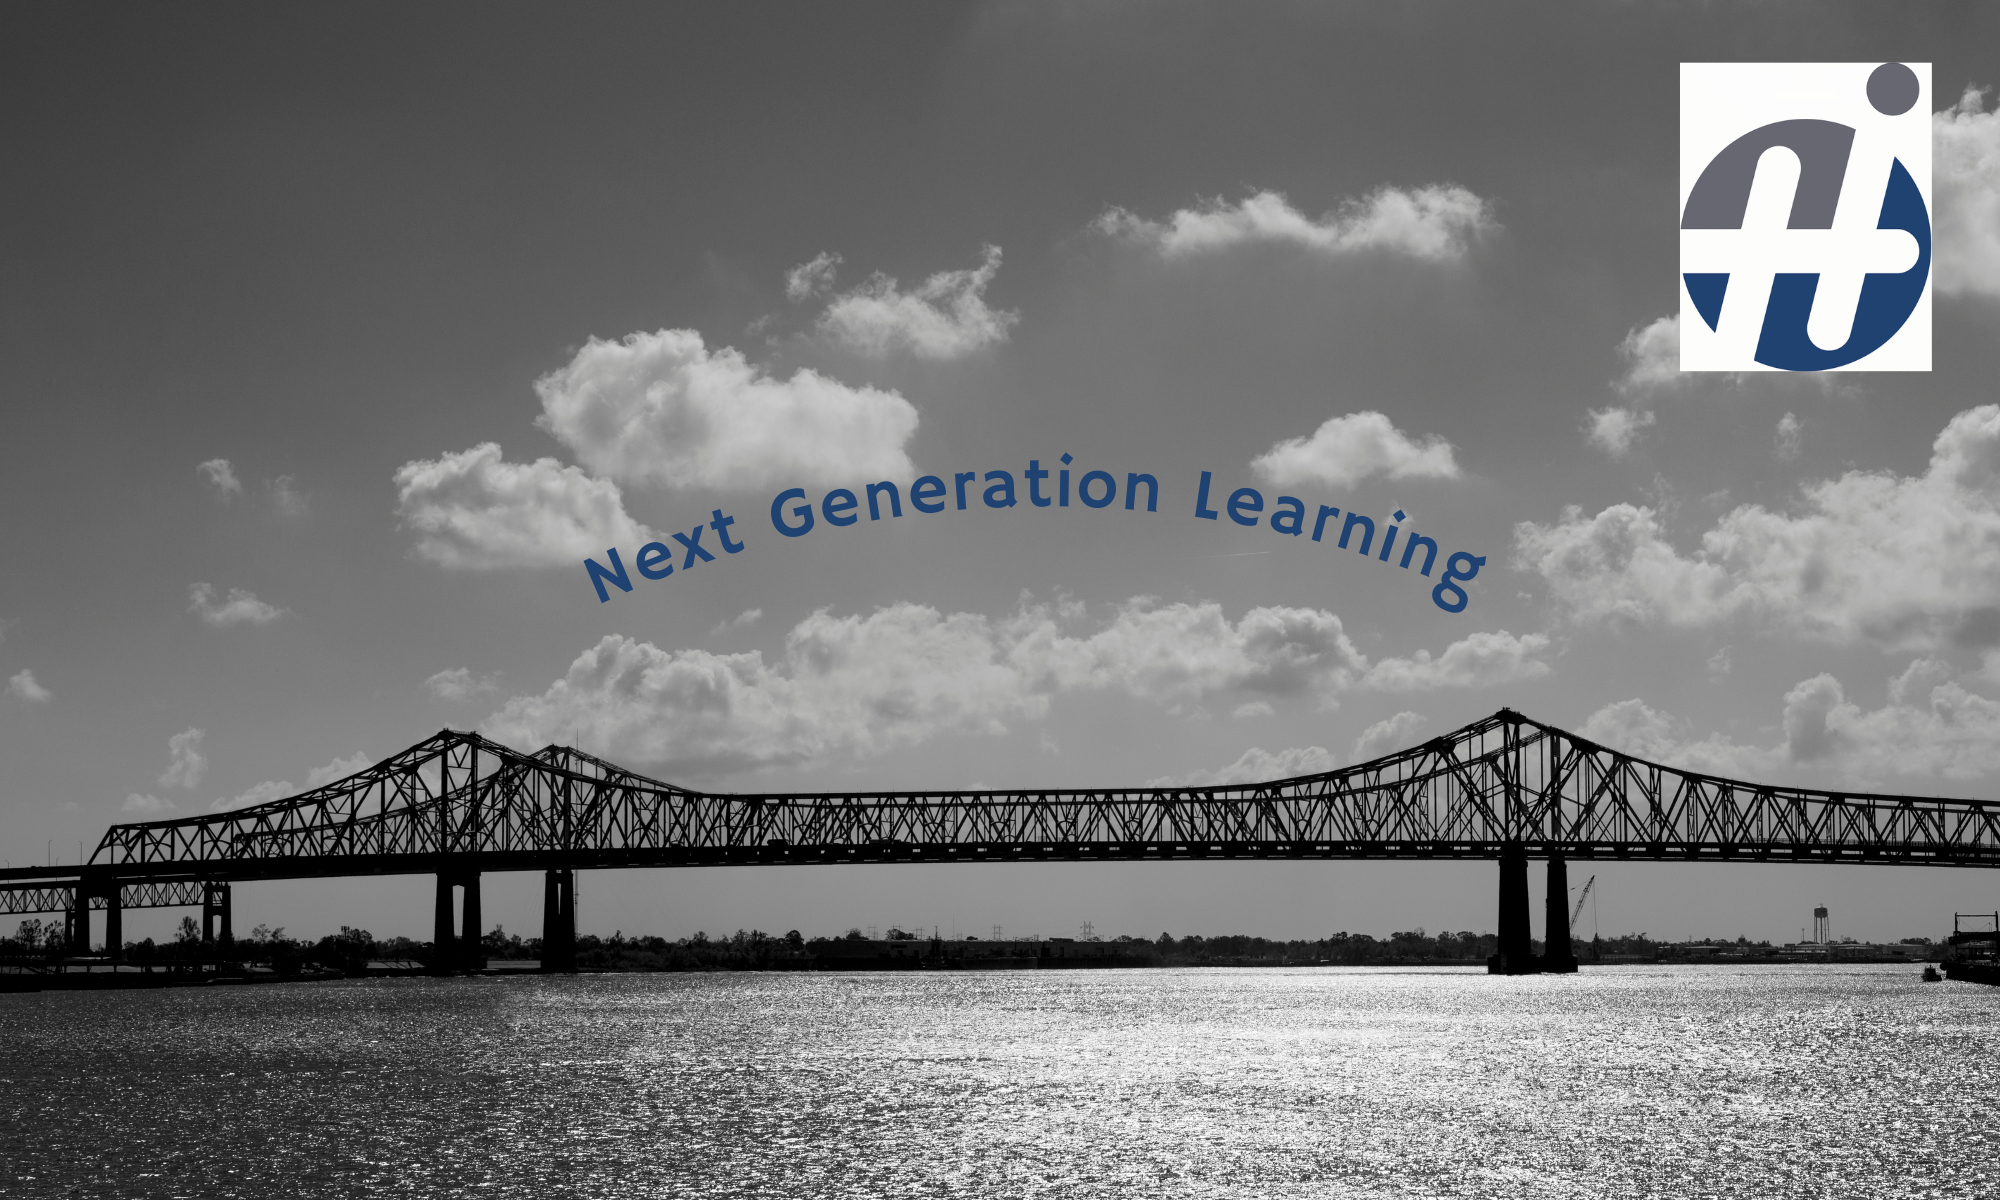 Next Generation Learning